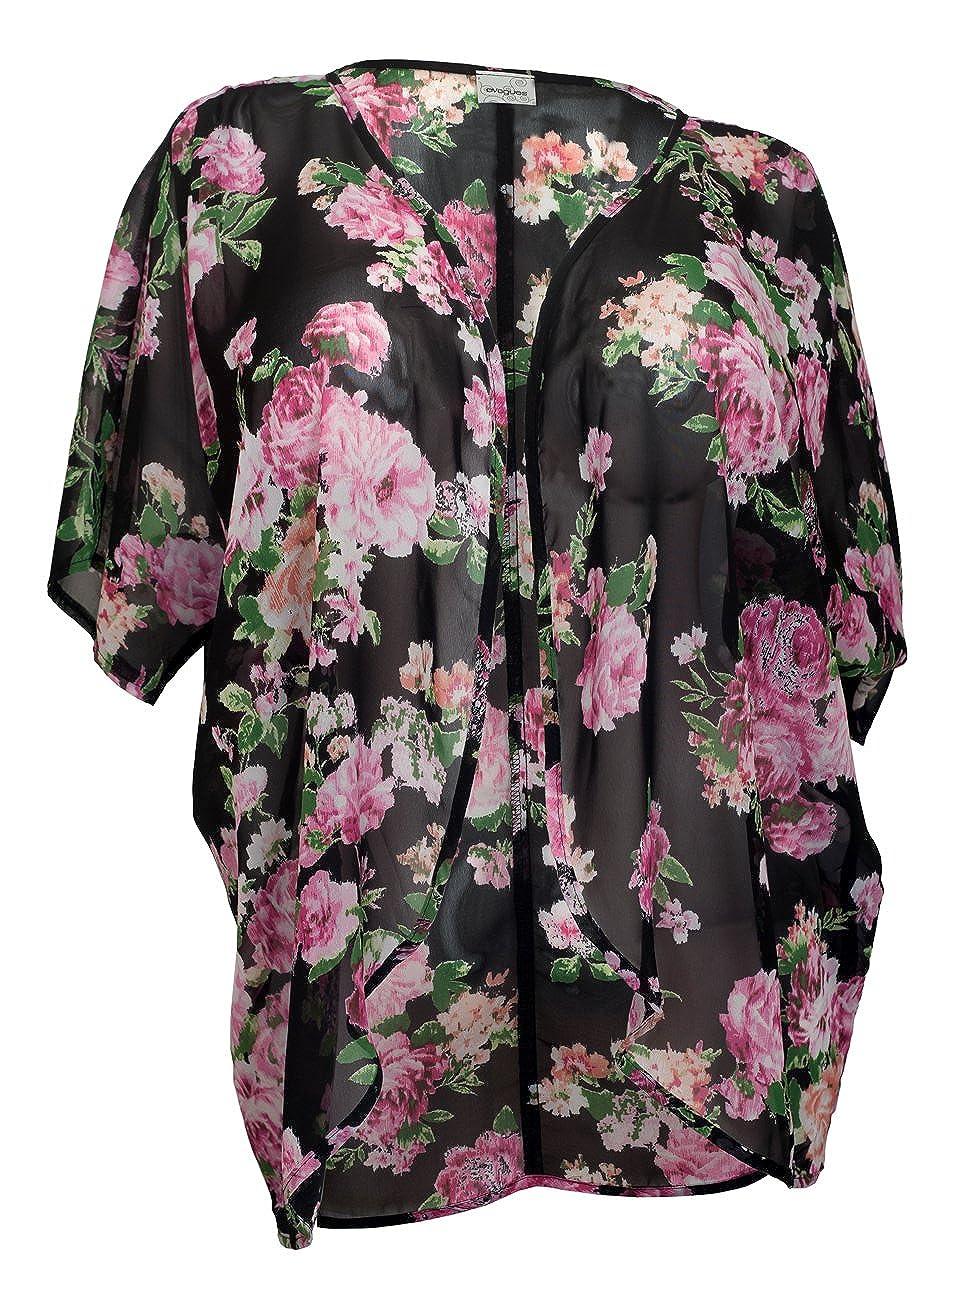 fcebd4842f5 eVogues Plus Size Floral Chiffon Kimono Cardigan Black - 1X at Amazon  Women s Clothing store